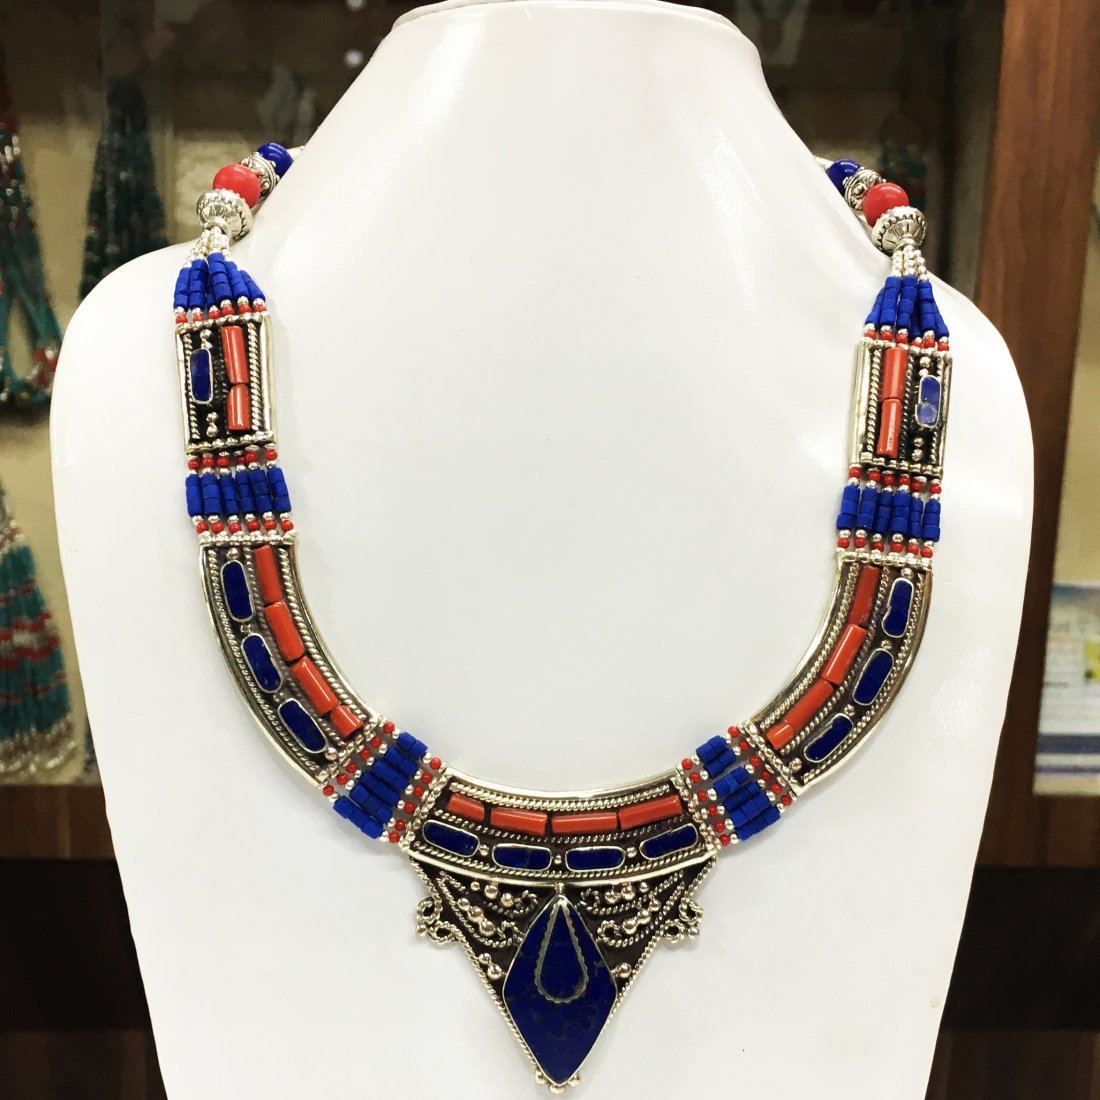 Gypsy Tibetan Designer Lapis & Coral Necklace